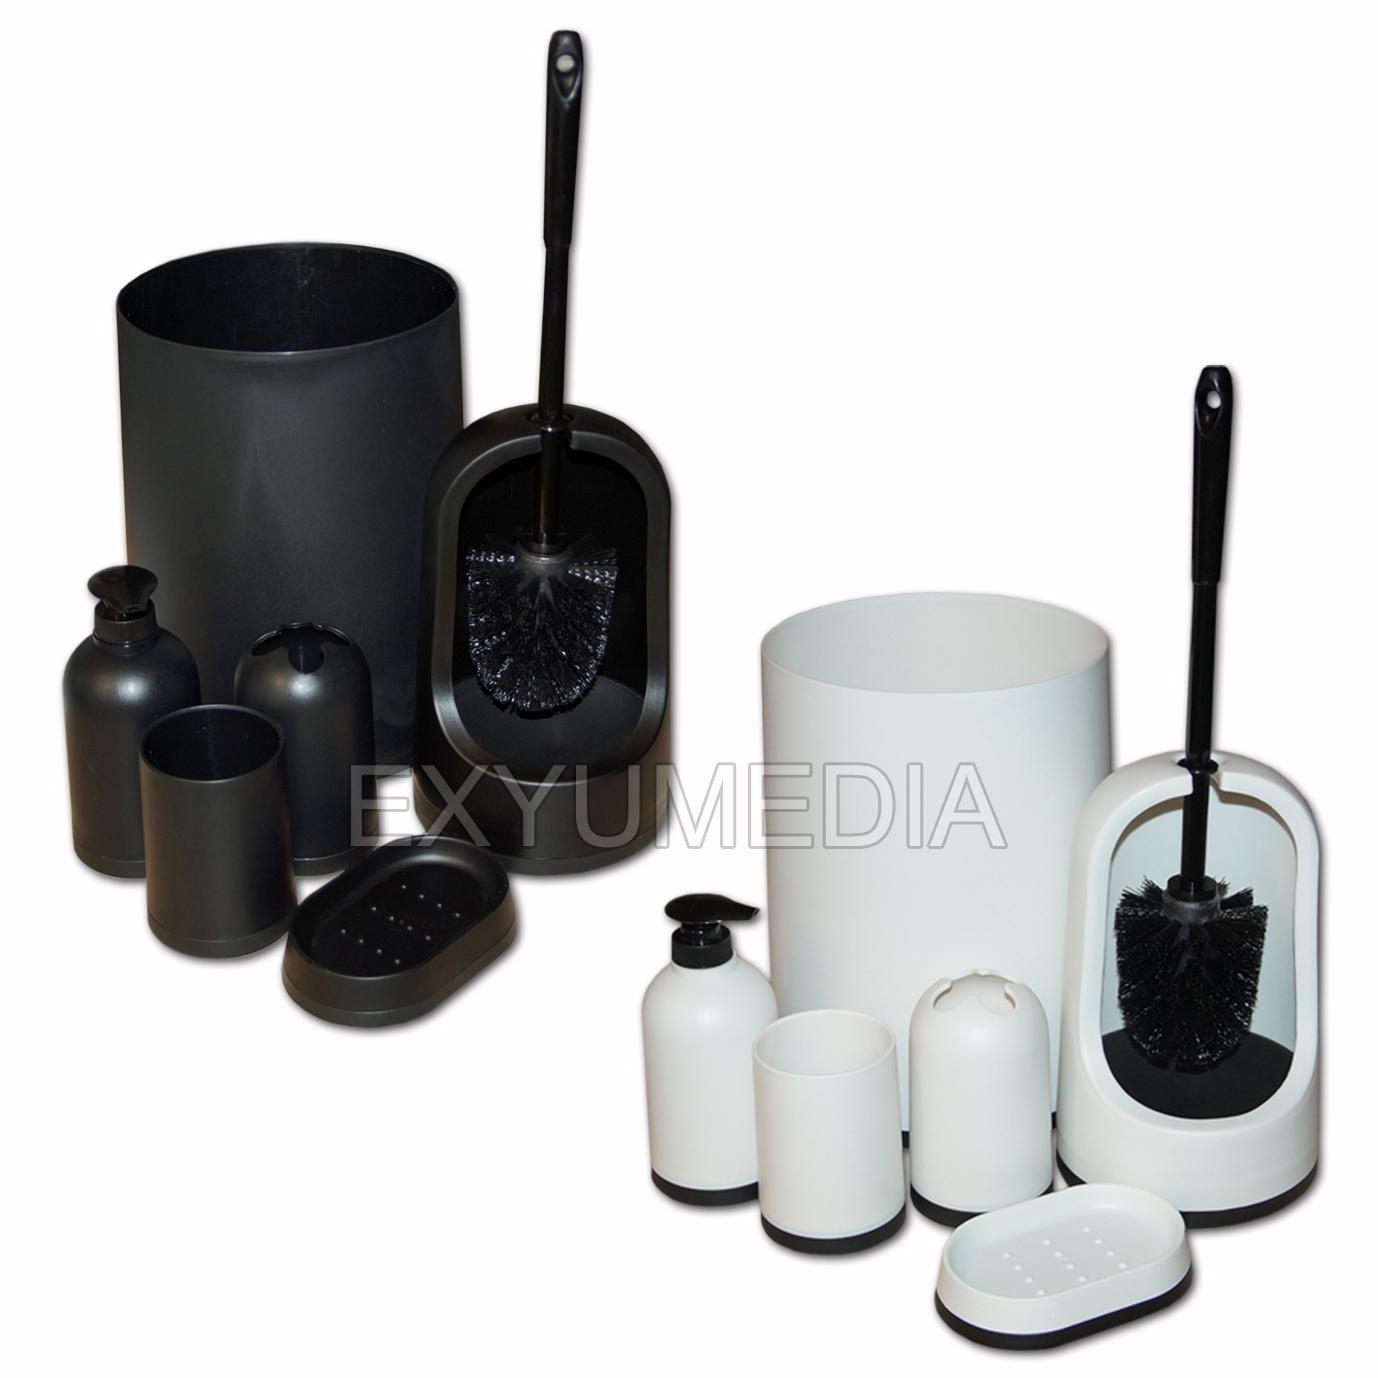 gro es badeset wc klo b rste seifenspender schale abfall eimer kosmetikeimer ebay. Black Bedroom Furniture Sets. Home Design Ideas